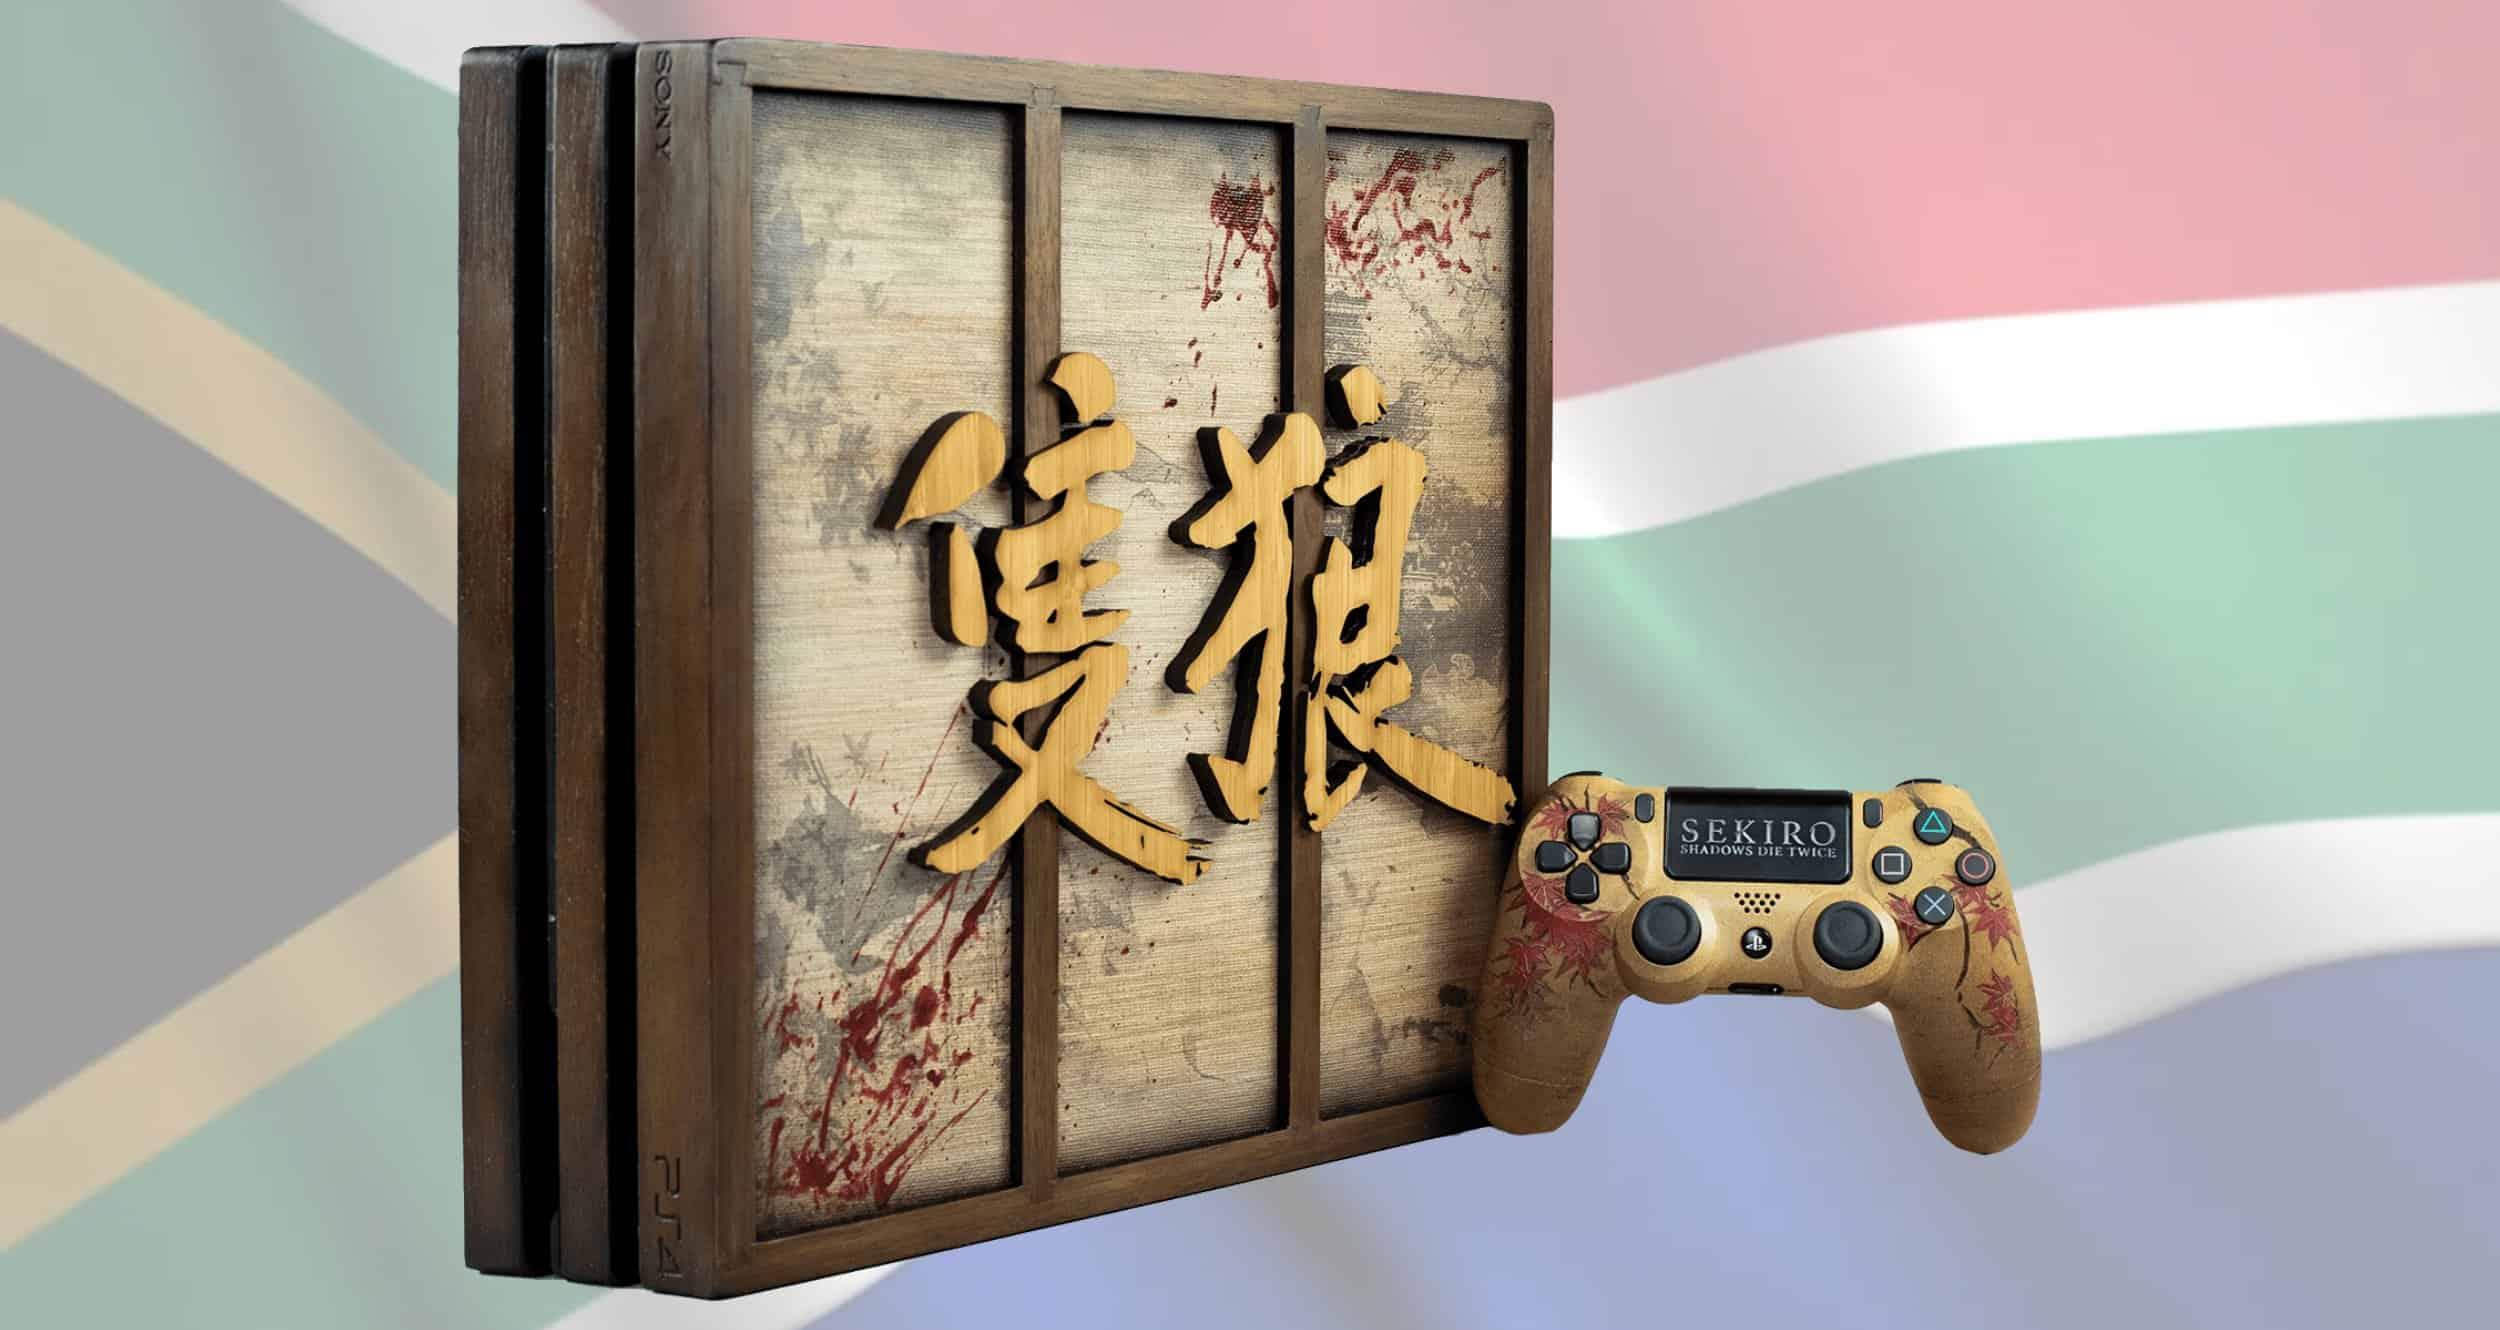 sekiro special edition xbox one console